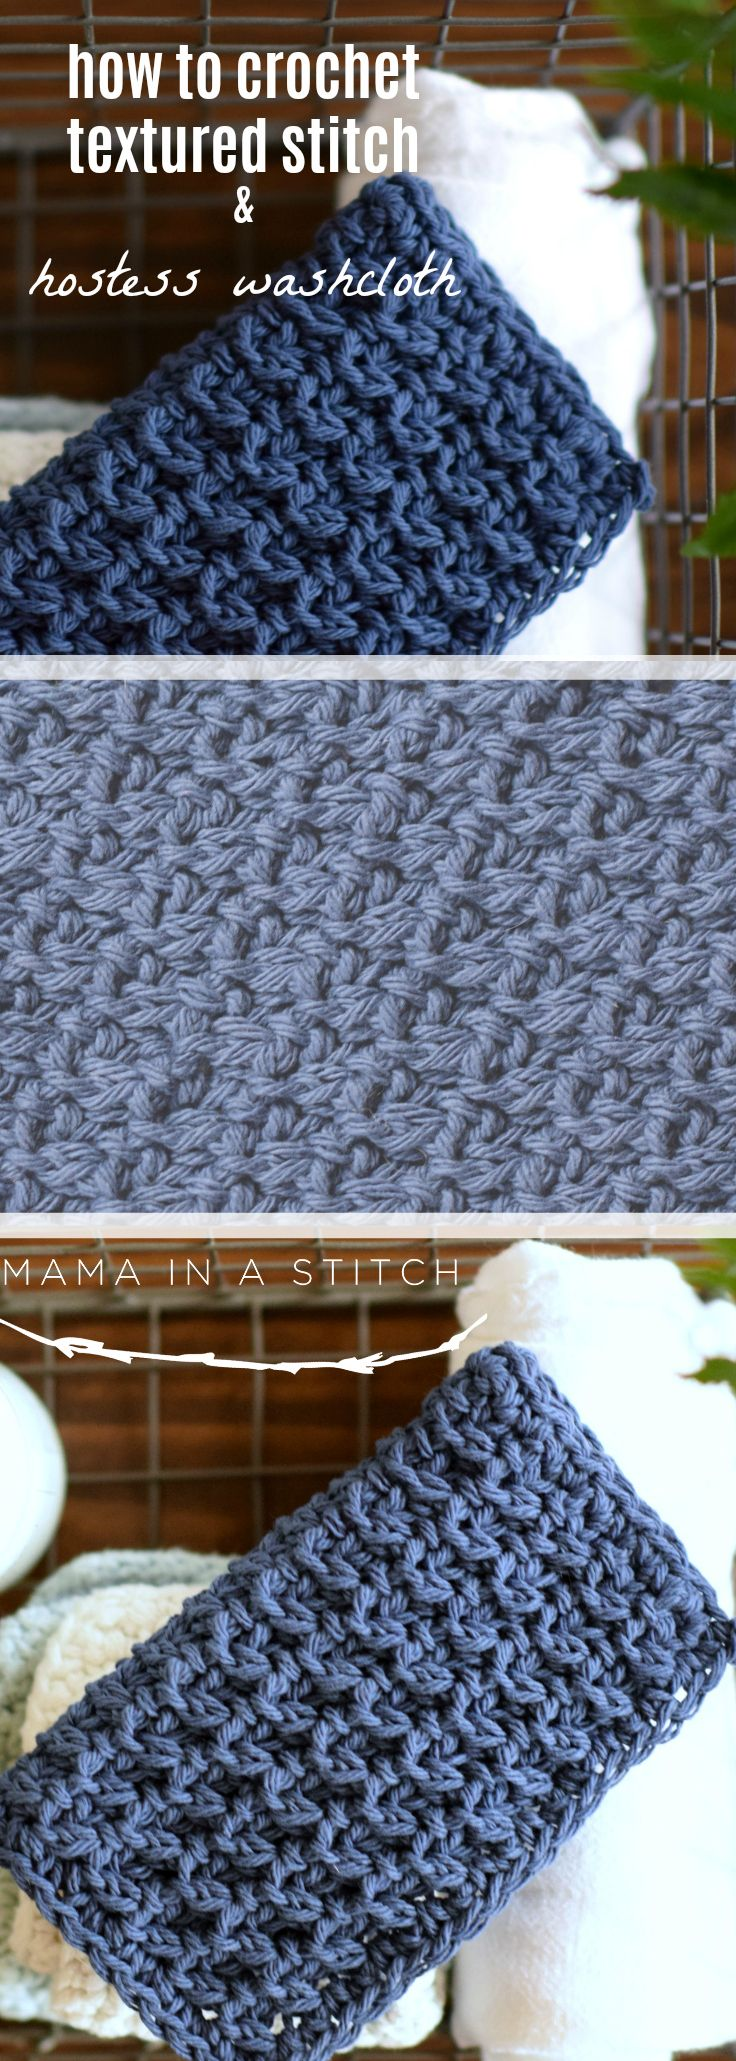 How To Crochet Textured Stitch & Hostess Washcloth via @MamaInAStitch